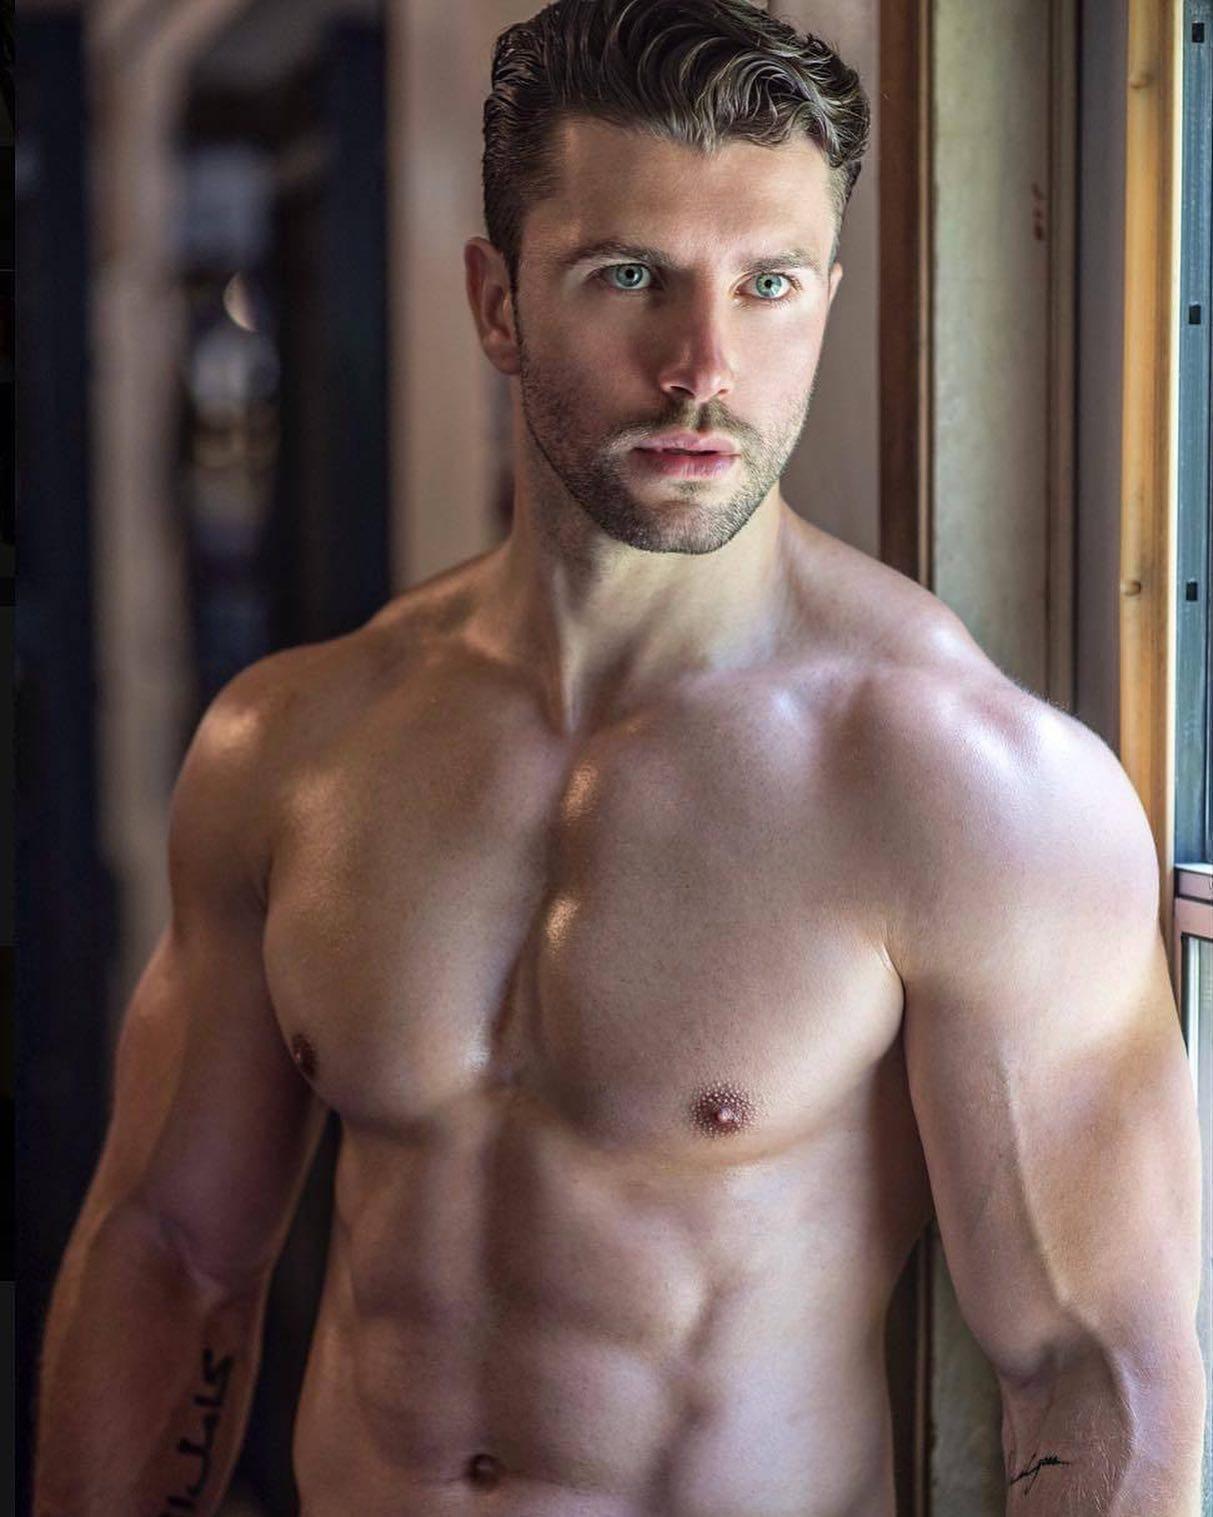 #men #hotmen #tatoo #abs #muscle